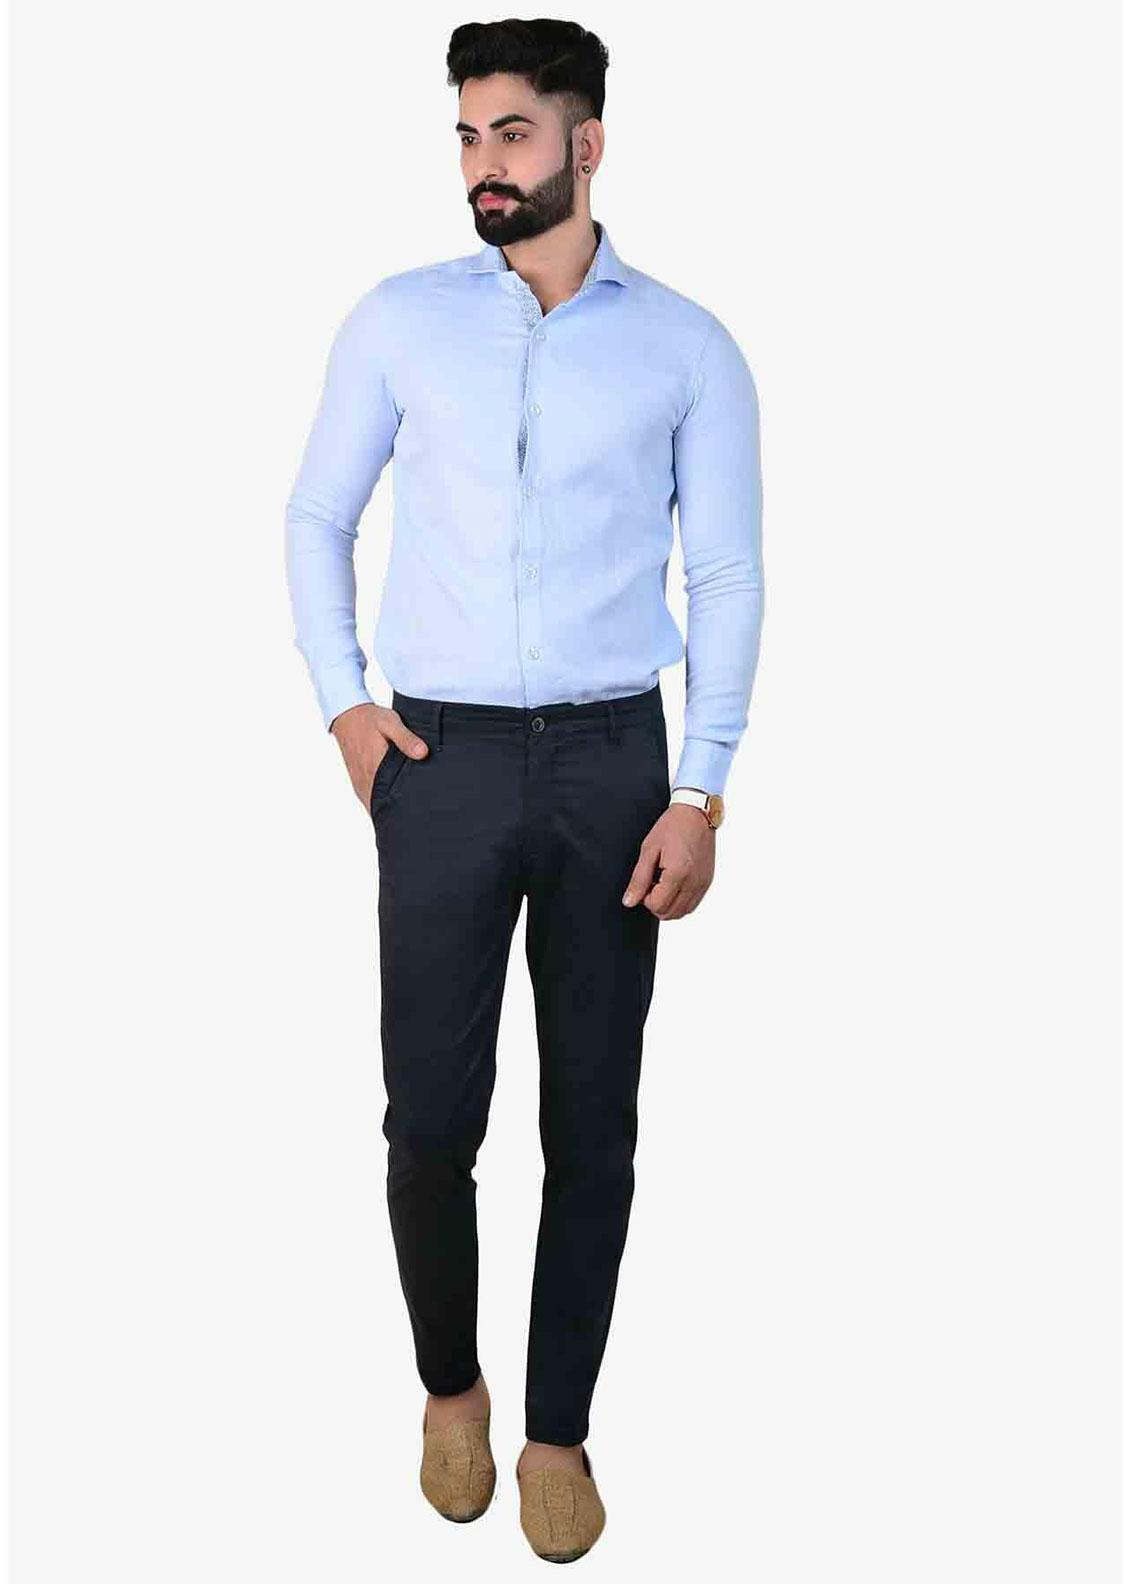 Ignite Wardrobe Cotton Stretchable Chino Men Pants -  IG20PNM 034